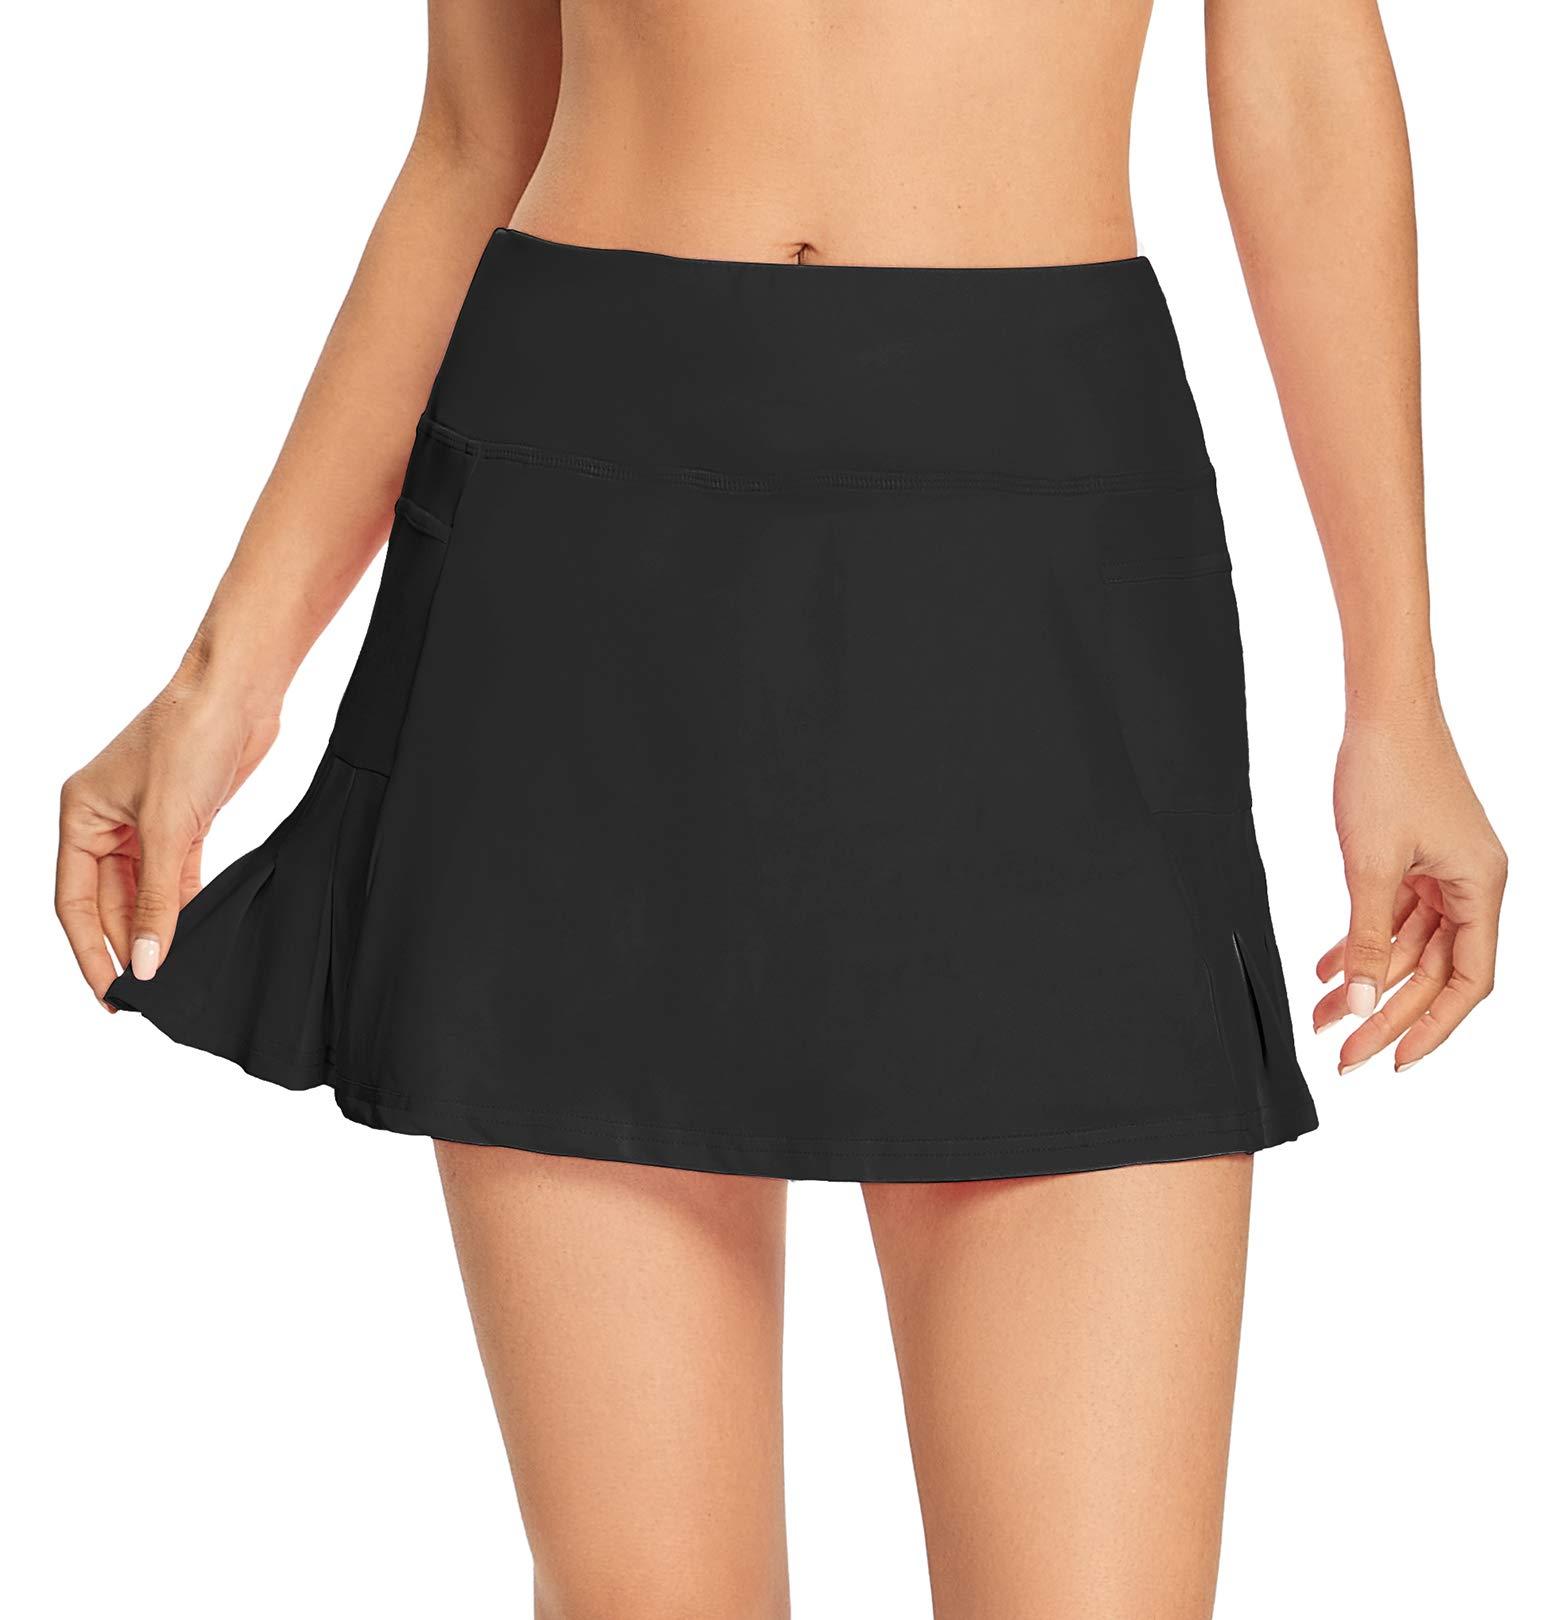 Raroauf Women's Athletic Skorts Lightweight Active Skirts with Shorts Running Tennis Golf Workout Mini Skirt with Pockets